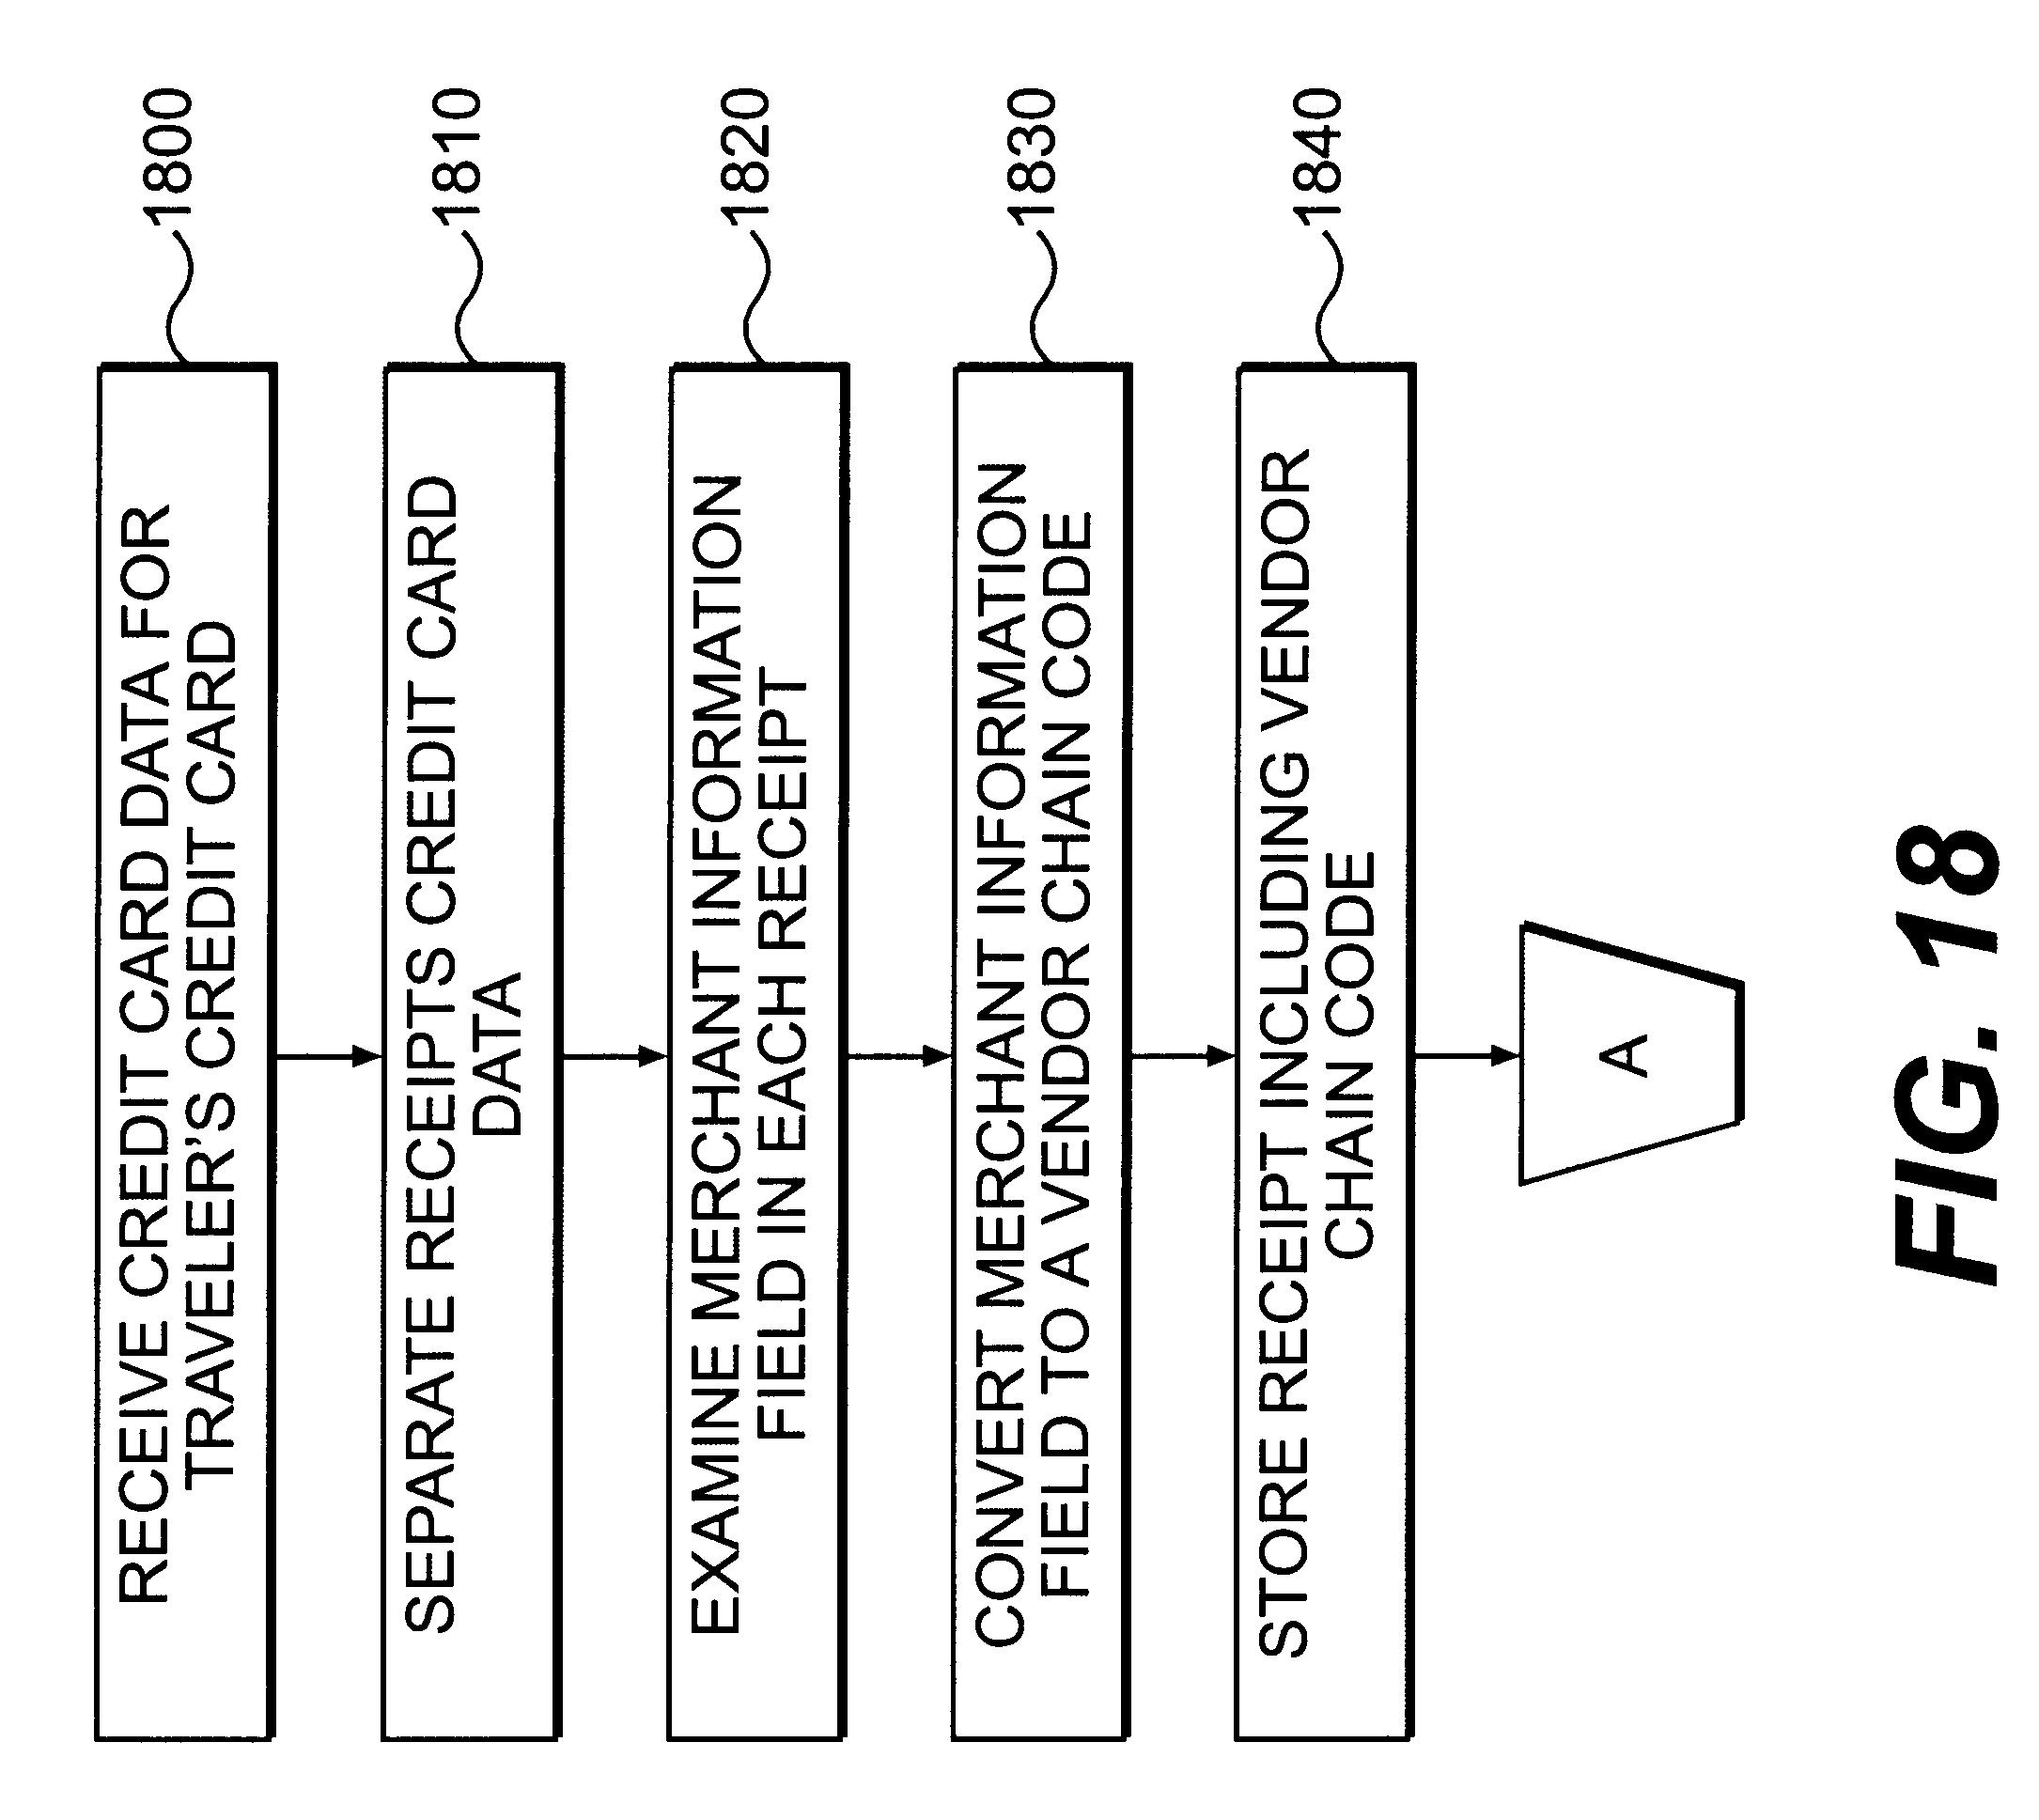 Patent US 6,442,526 B1